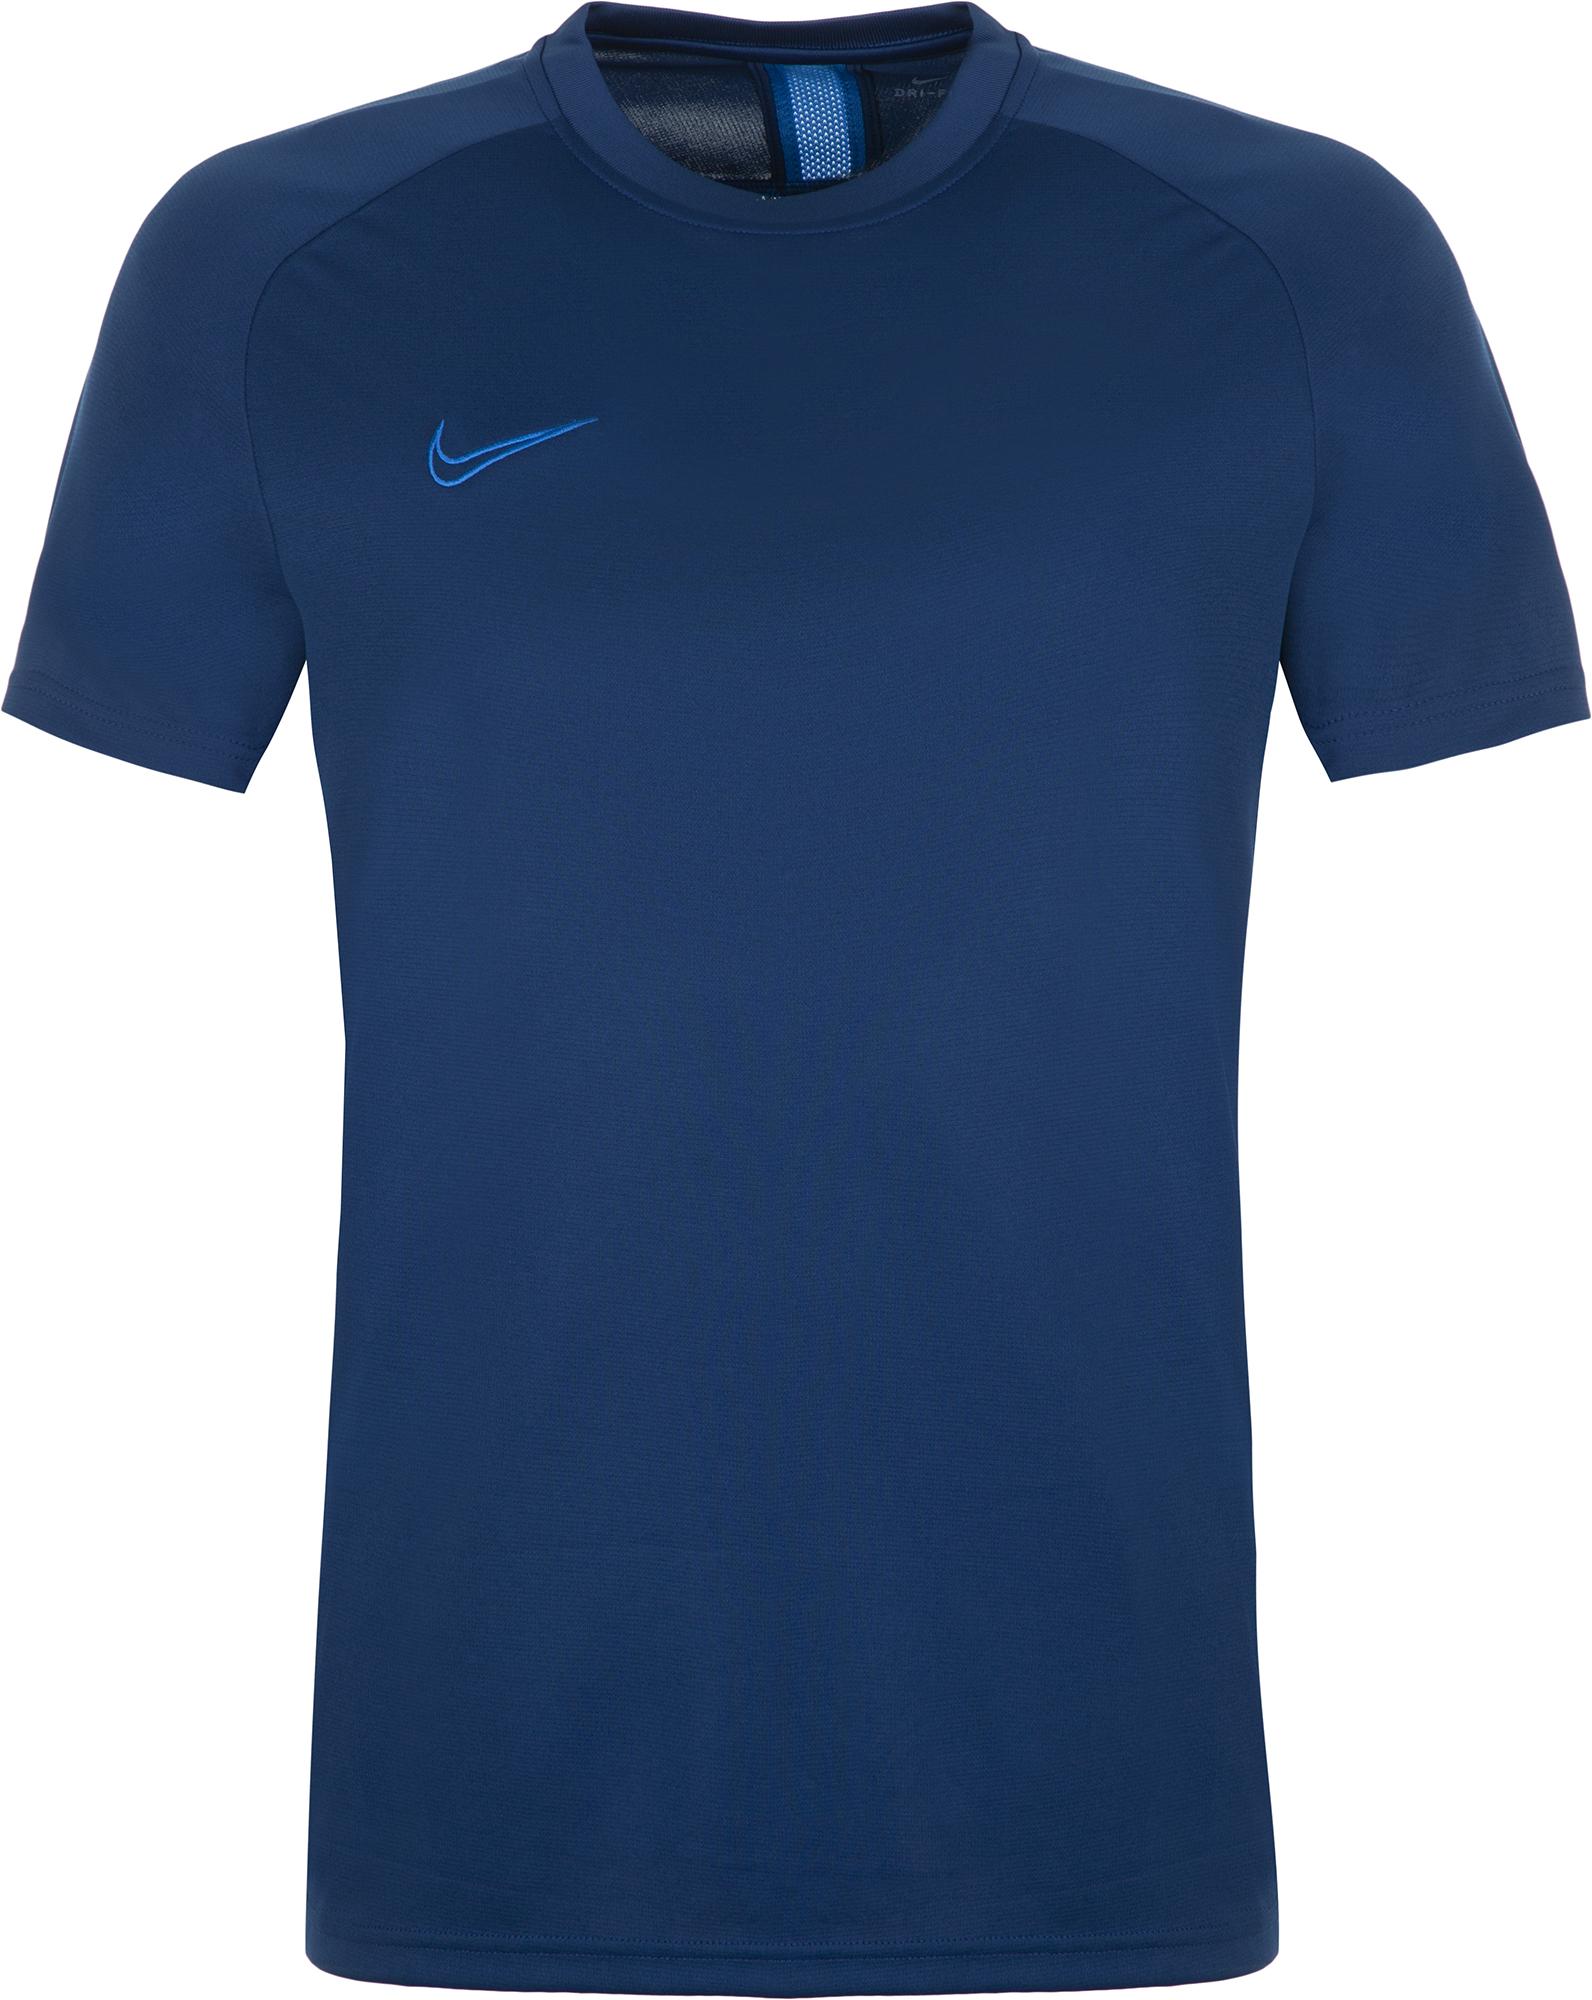 Nike Футболка мужская Nike Dry Academy, размер 46-48